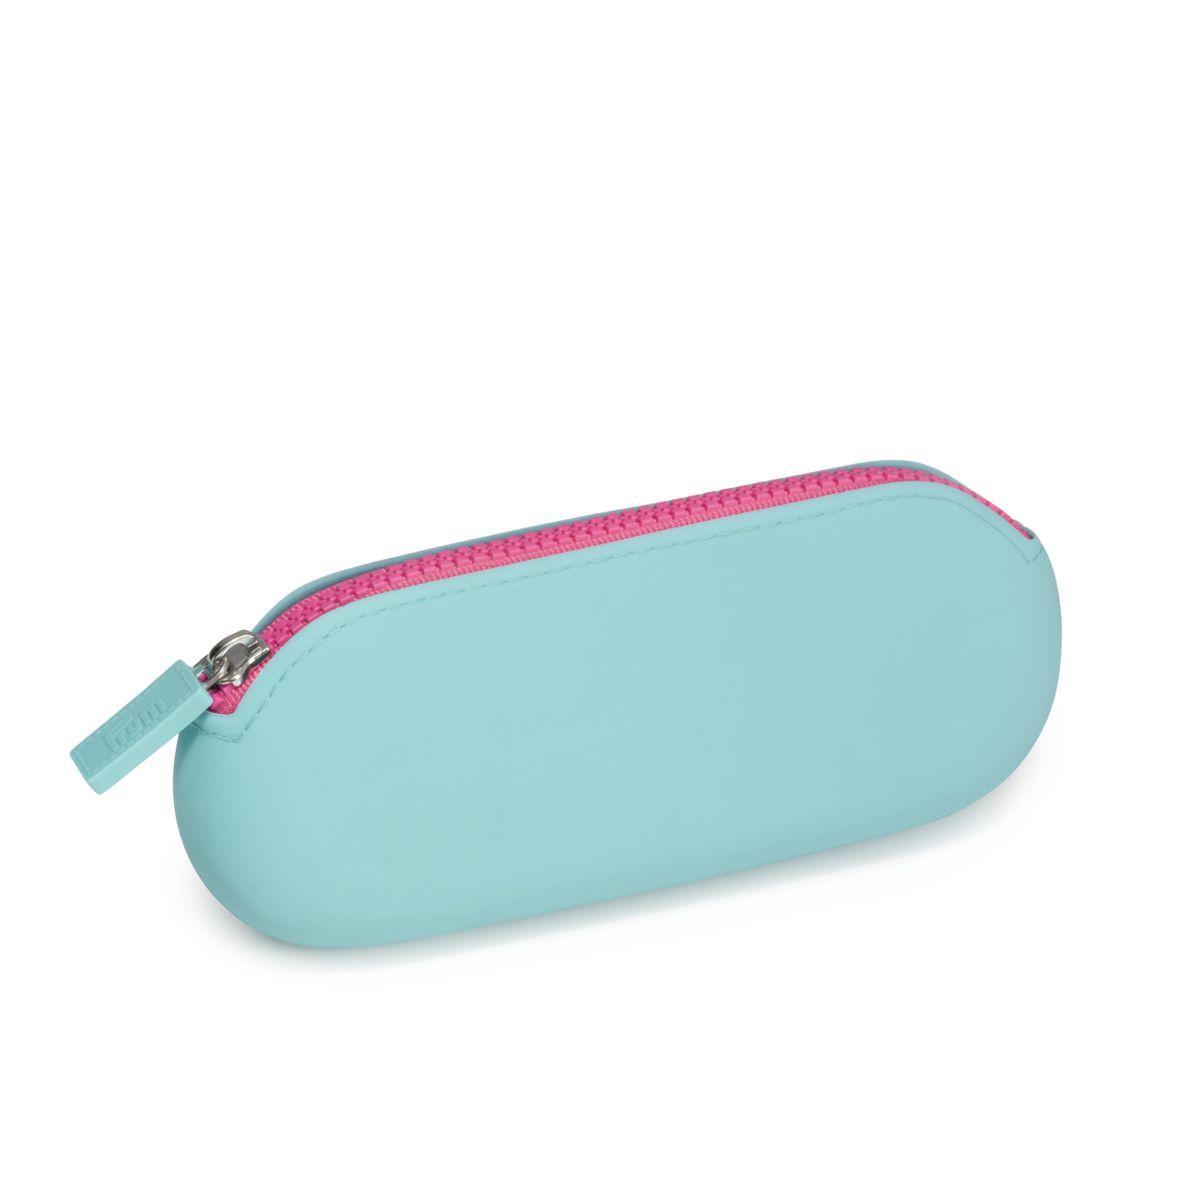 Prym Love Soft Etui Candy türkis pink Silikon 19x9x2,5cm